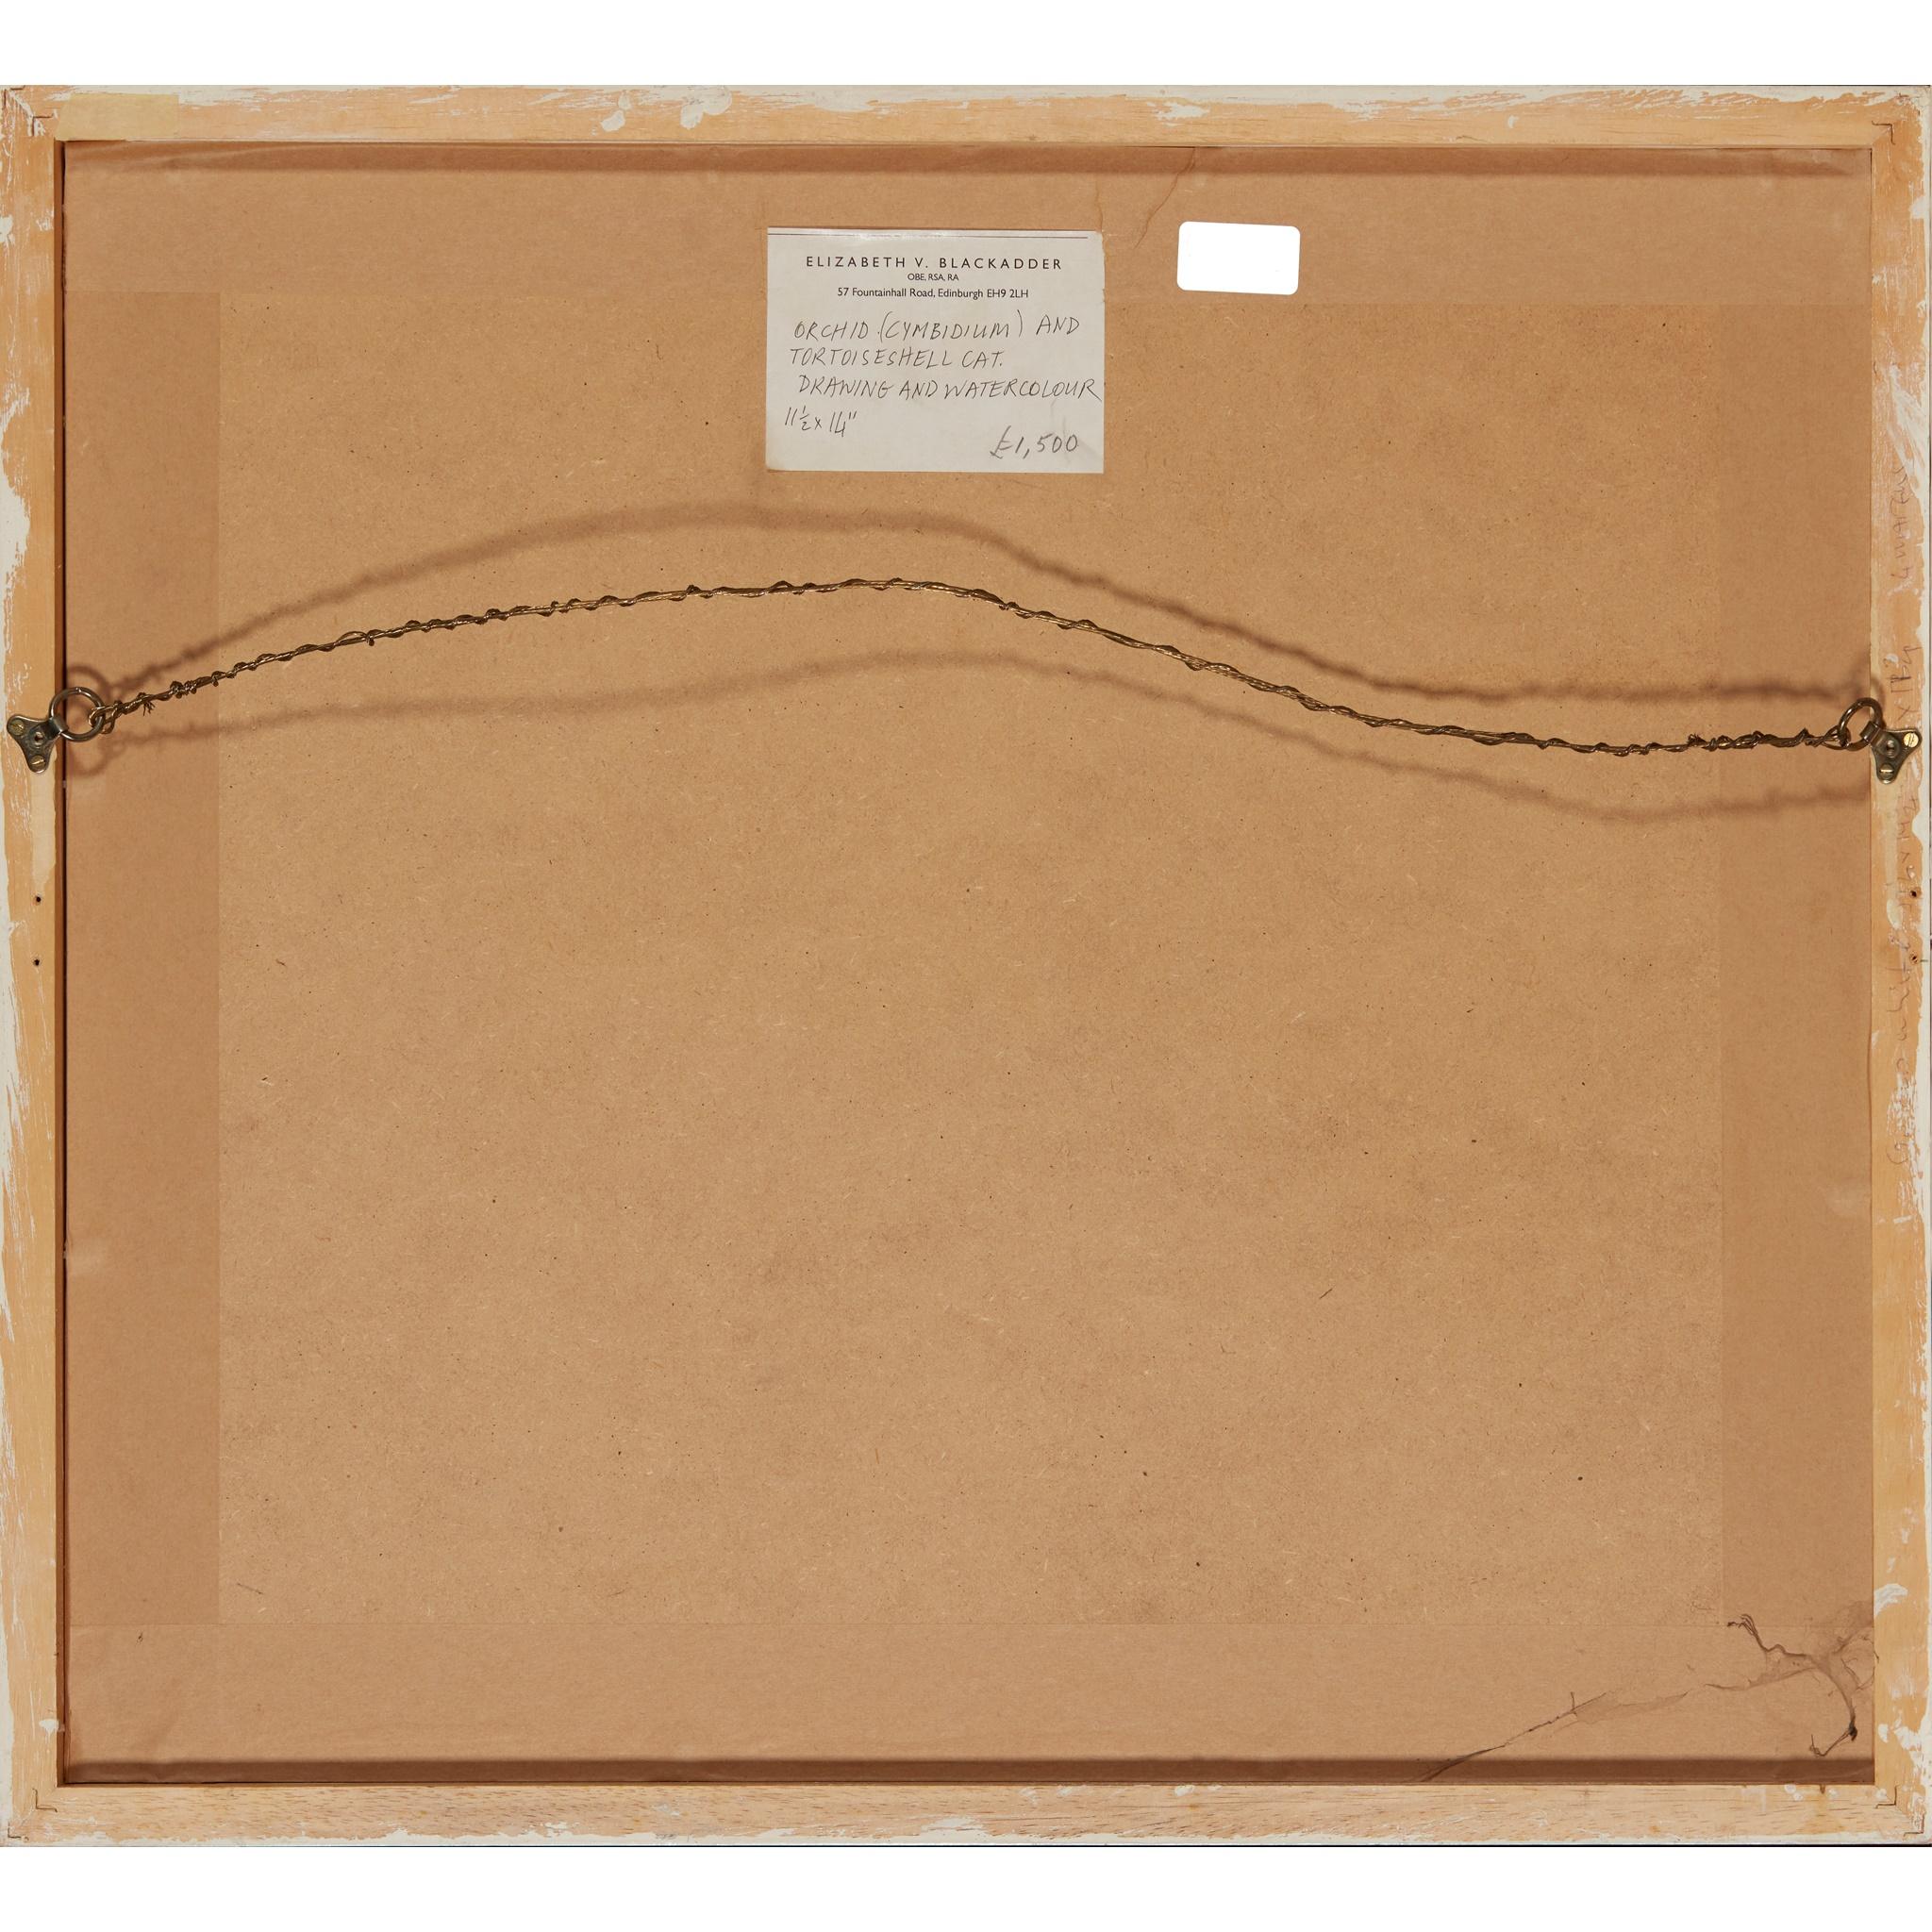 § DAME ELIZABETH BLACKADDER O.B.E., R.A., R.S.A., R.S.W., R.G.I., D.Litt (SCOTTISH 1931-) ORCHID - Image 3 of 3